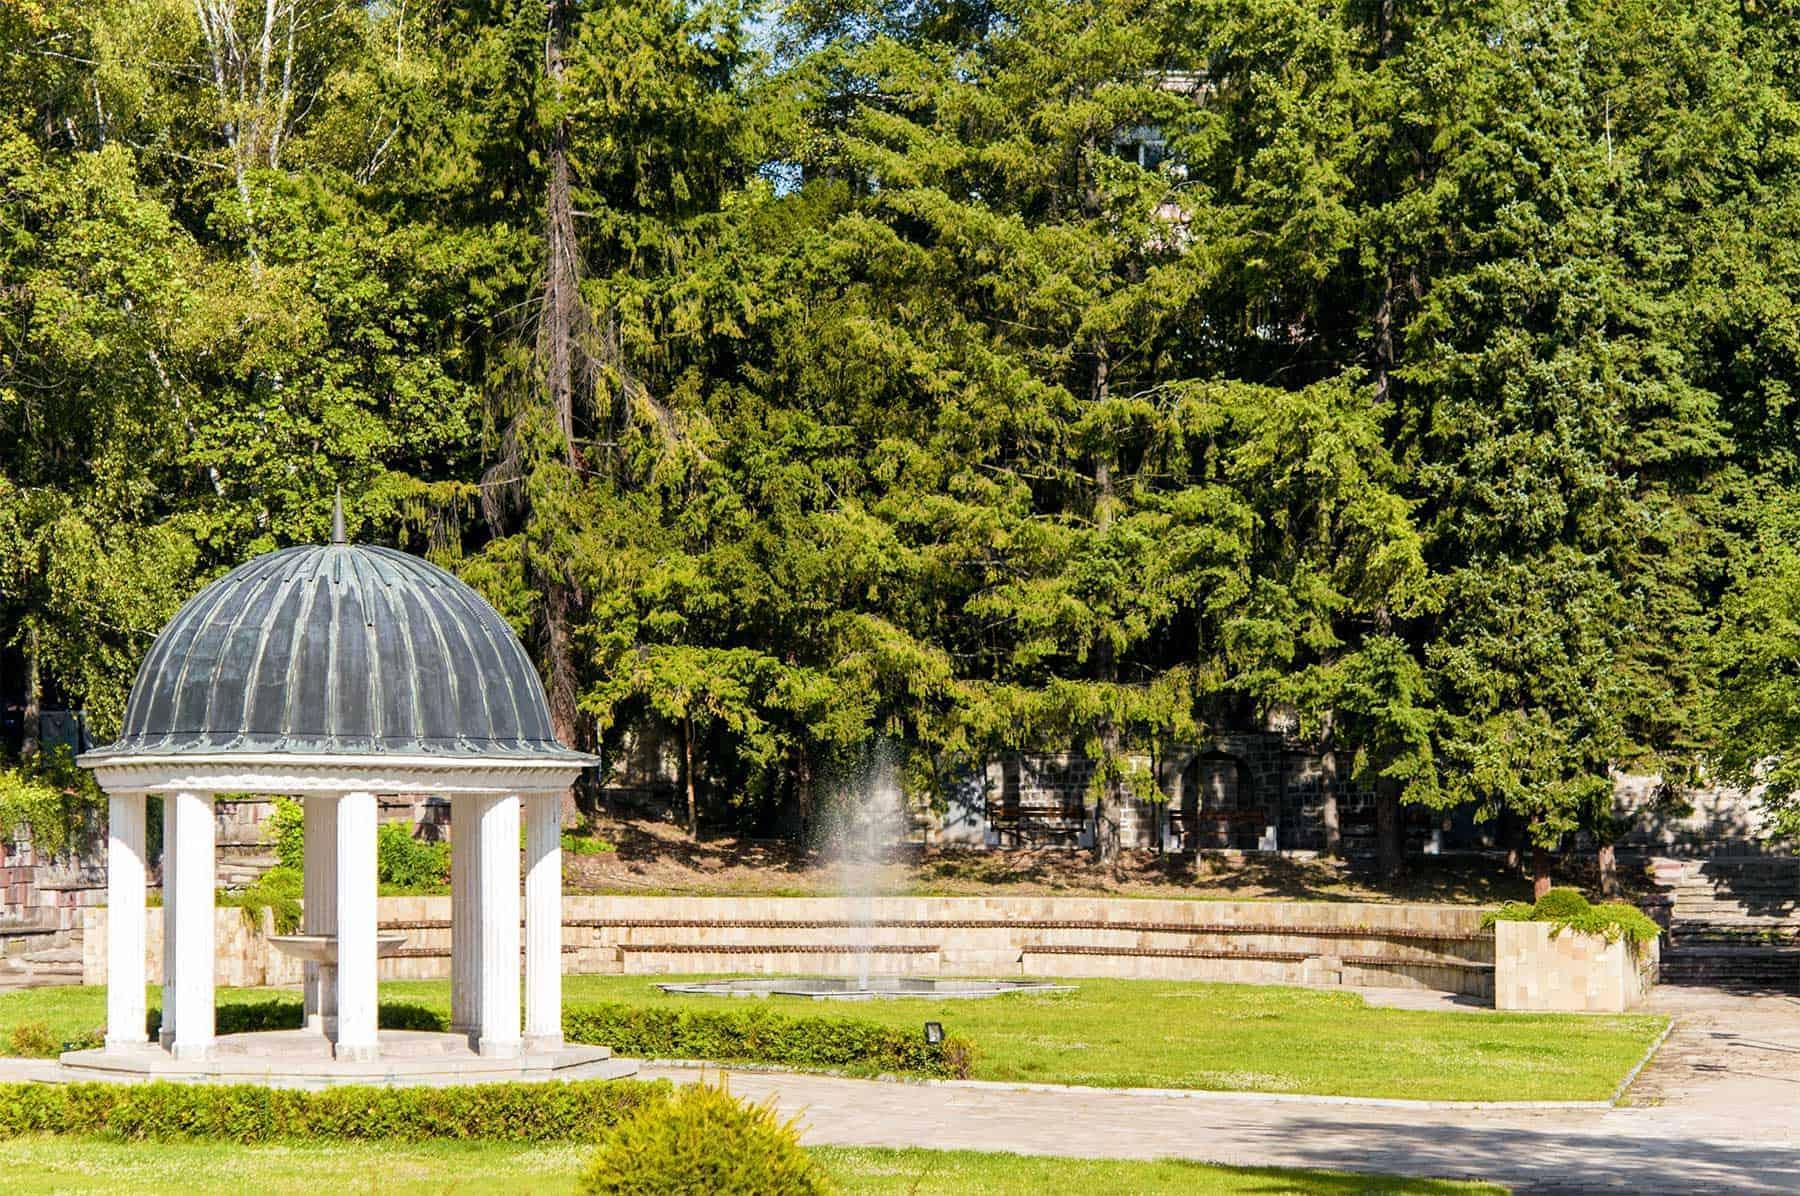 Bankya city park - Bulgaria